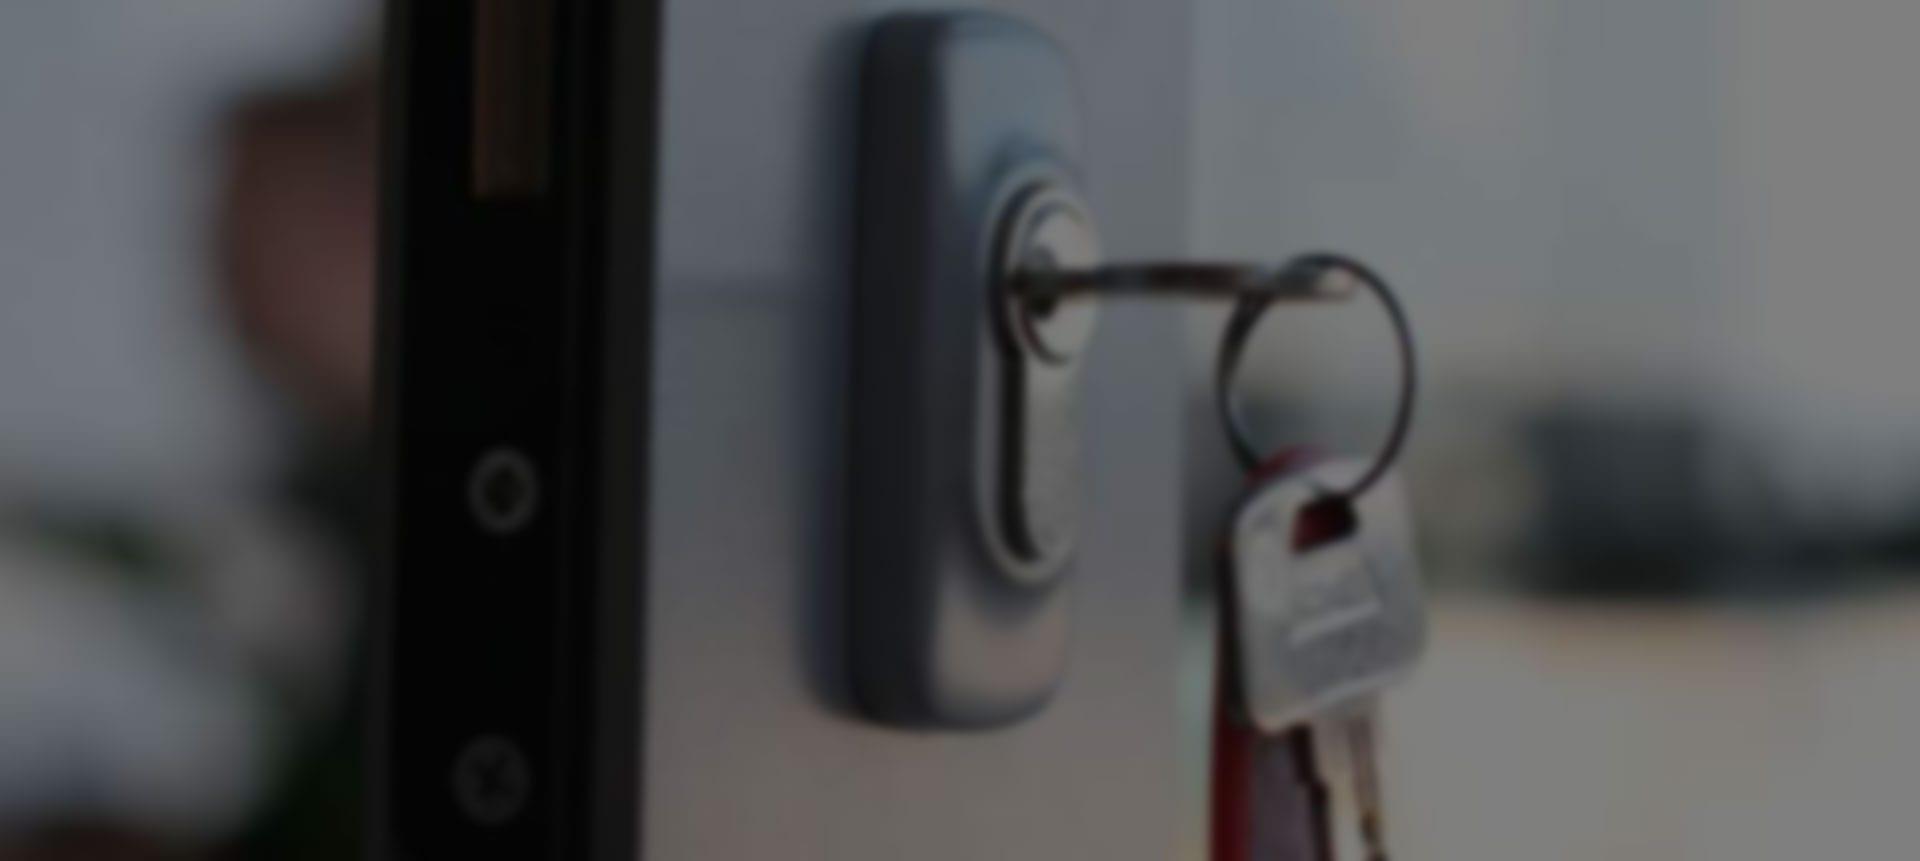 locksmith-slide-3